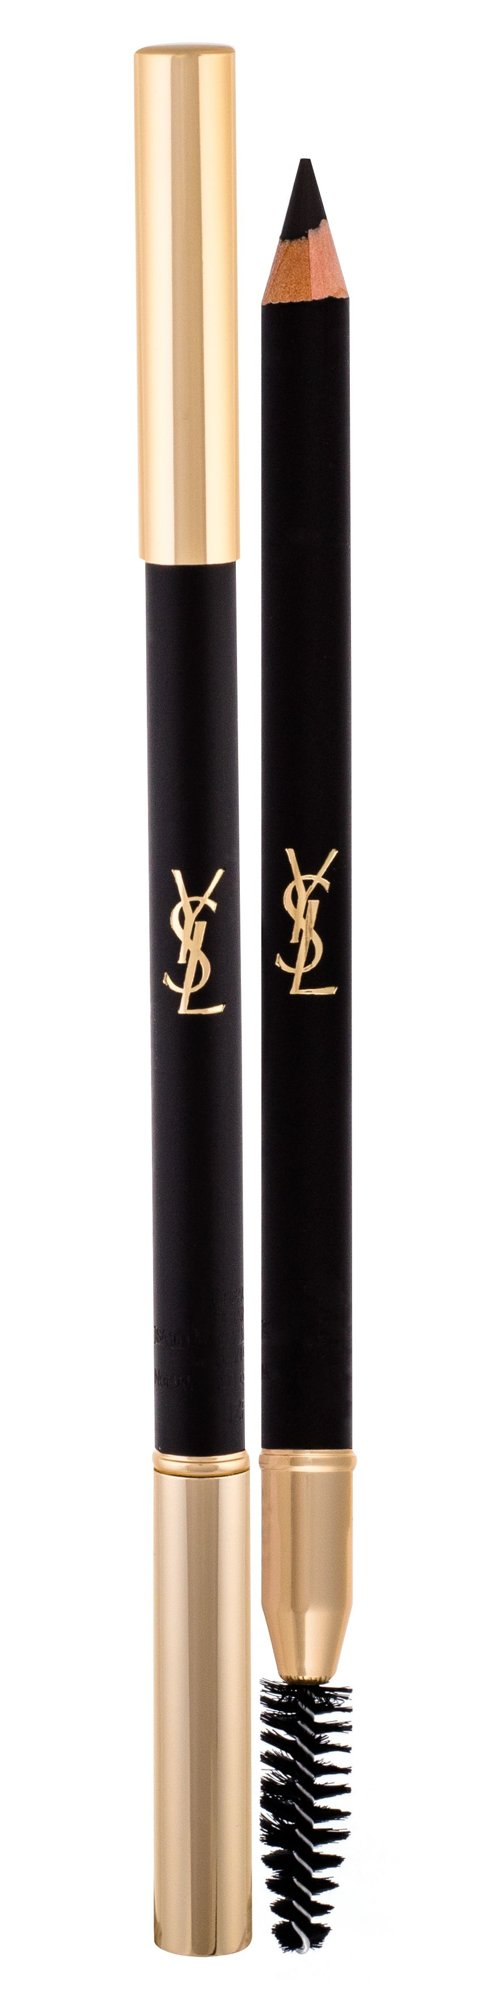 Yves Saint Laurent Eyebrow Pencil Cosmetic 1,3ml 5 Brown